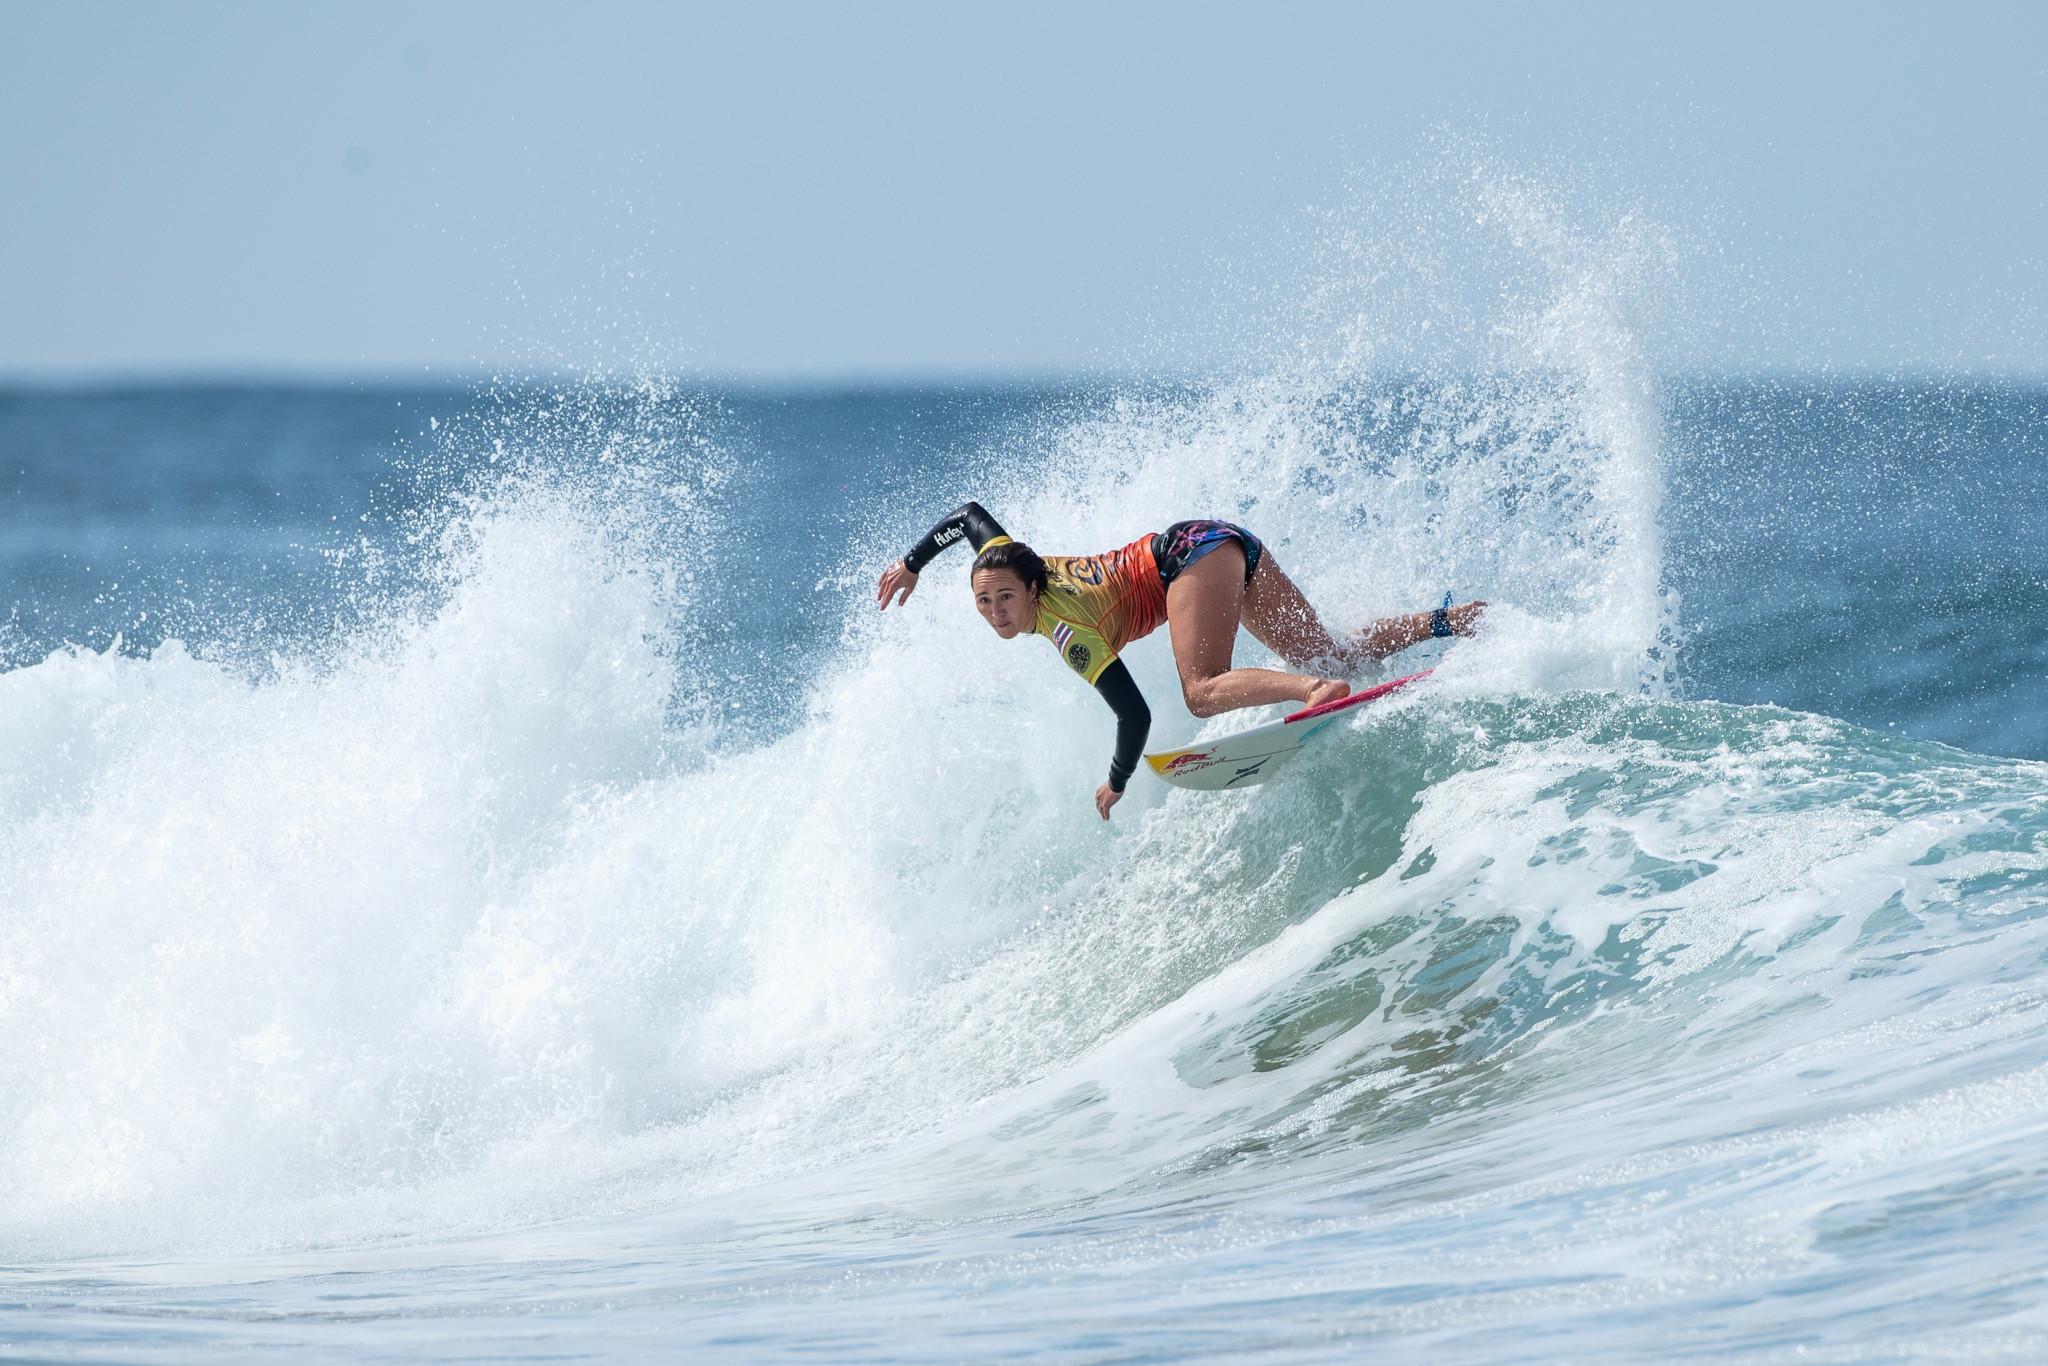 Moore advances to quarter-finals at World Surf League in Margaret River